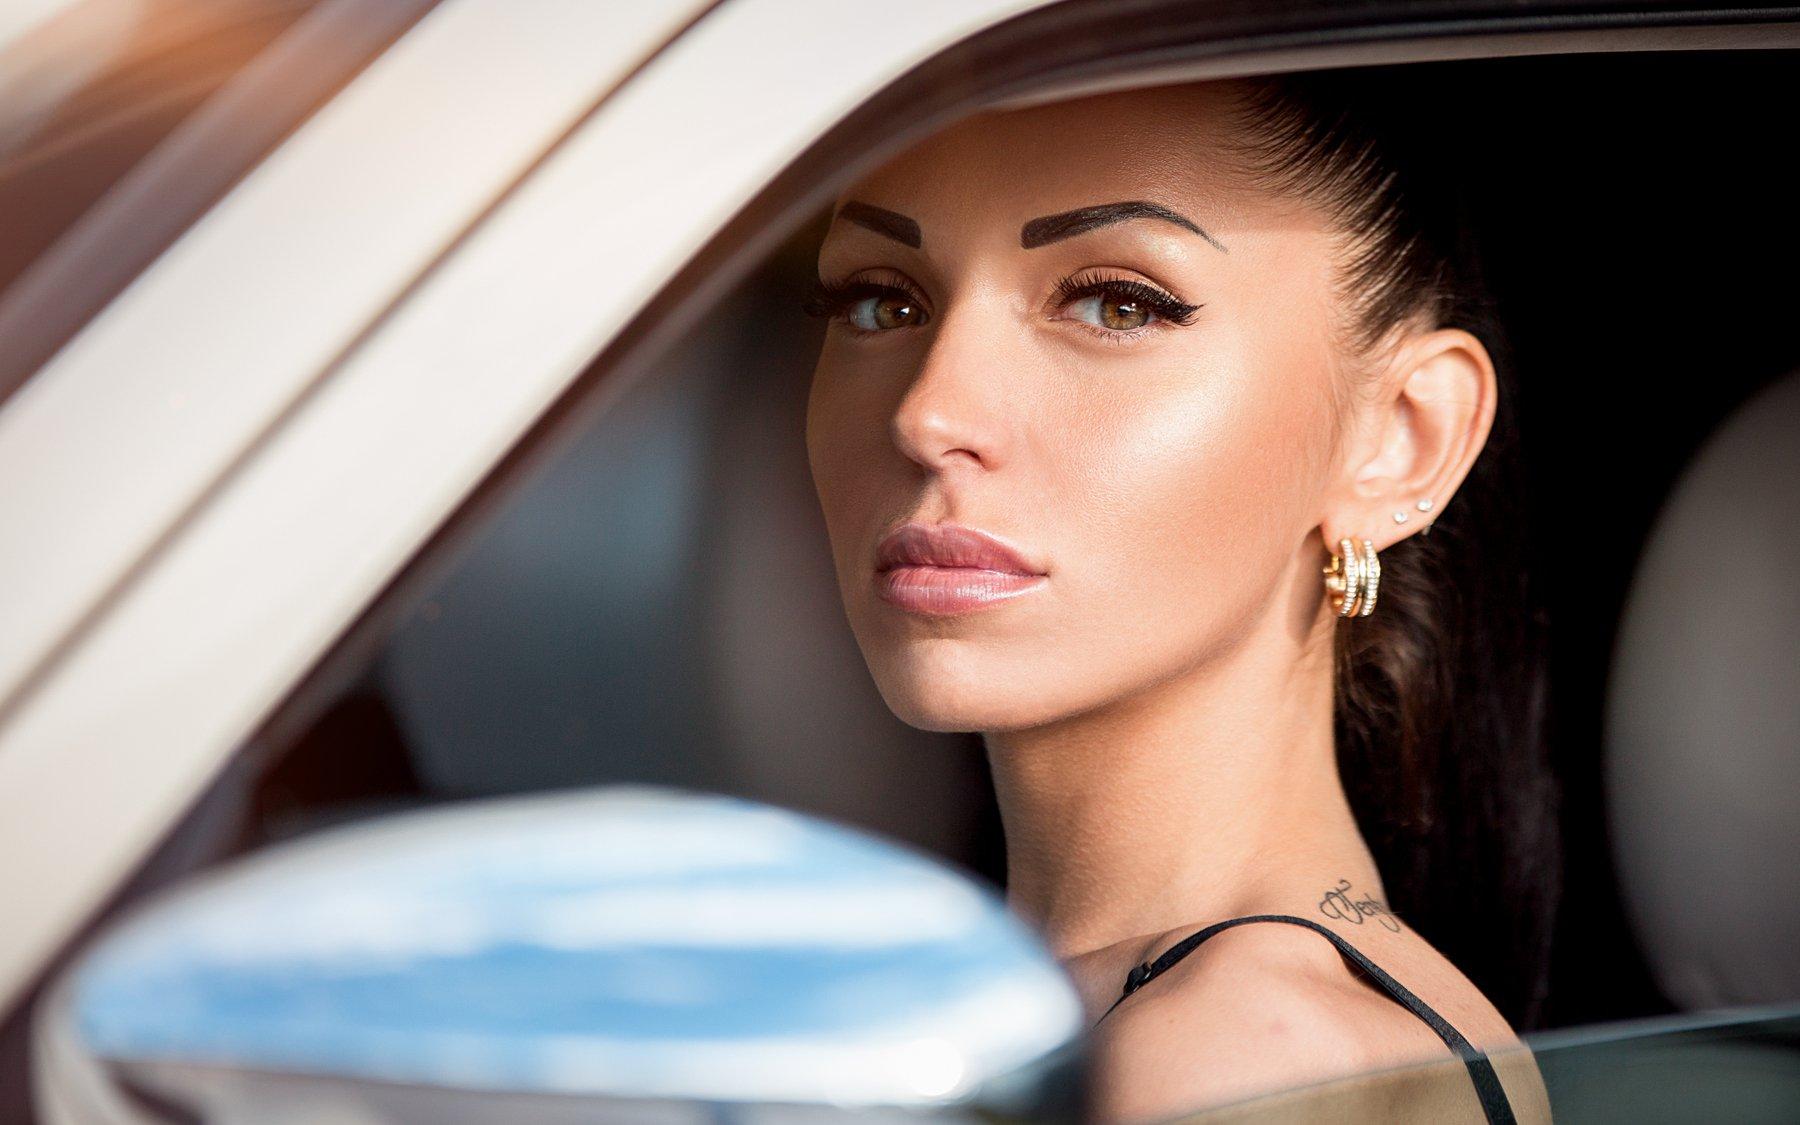 портрет, машина, за рулем, водитель, девушка за рулем, шофер, Сухарь Александр